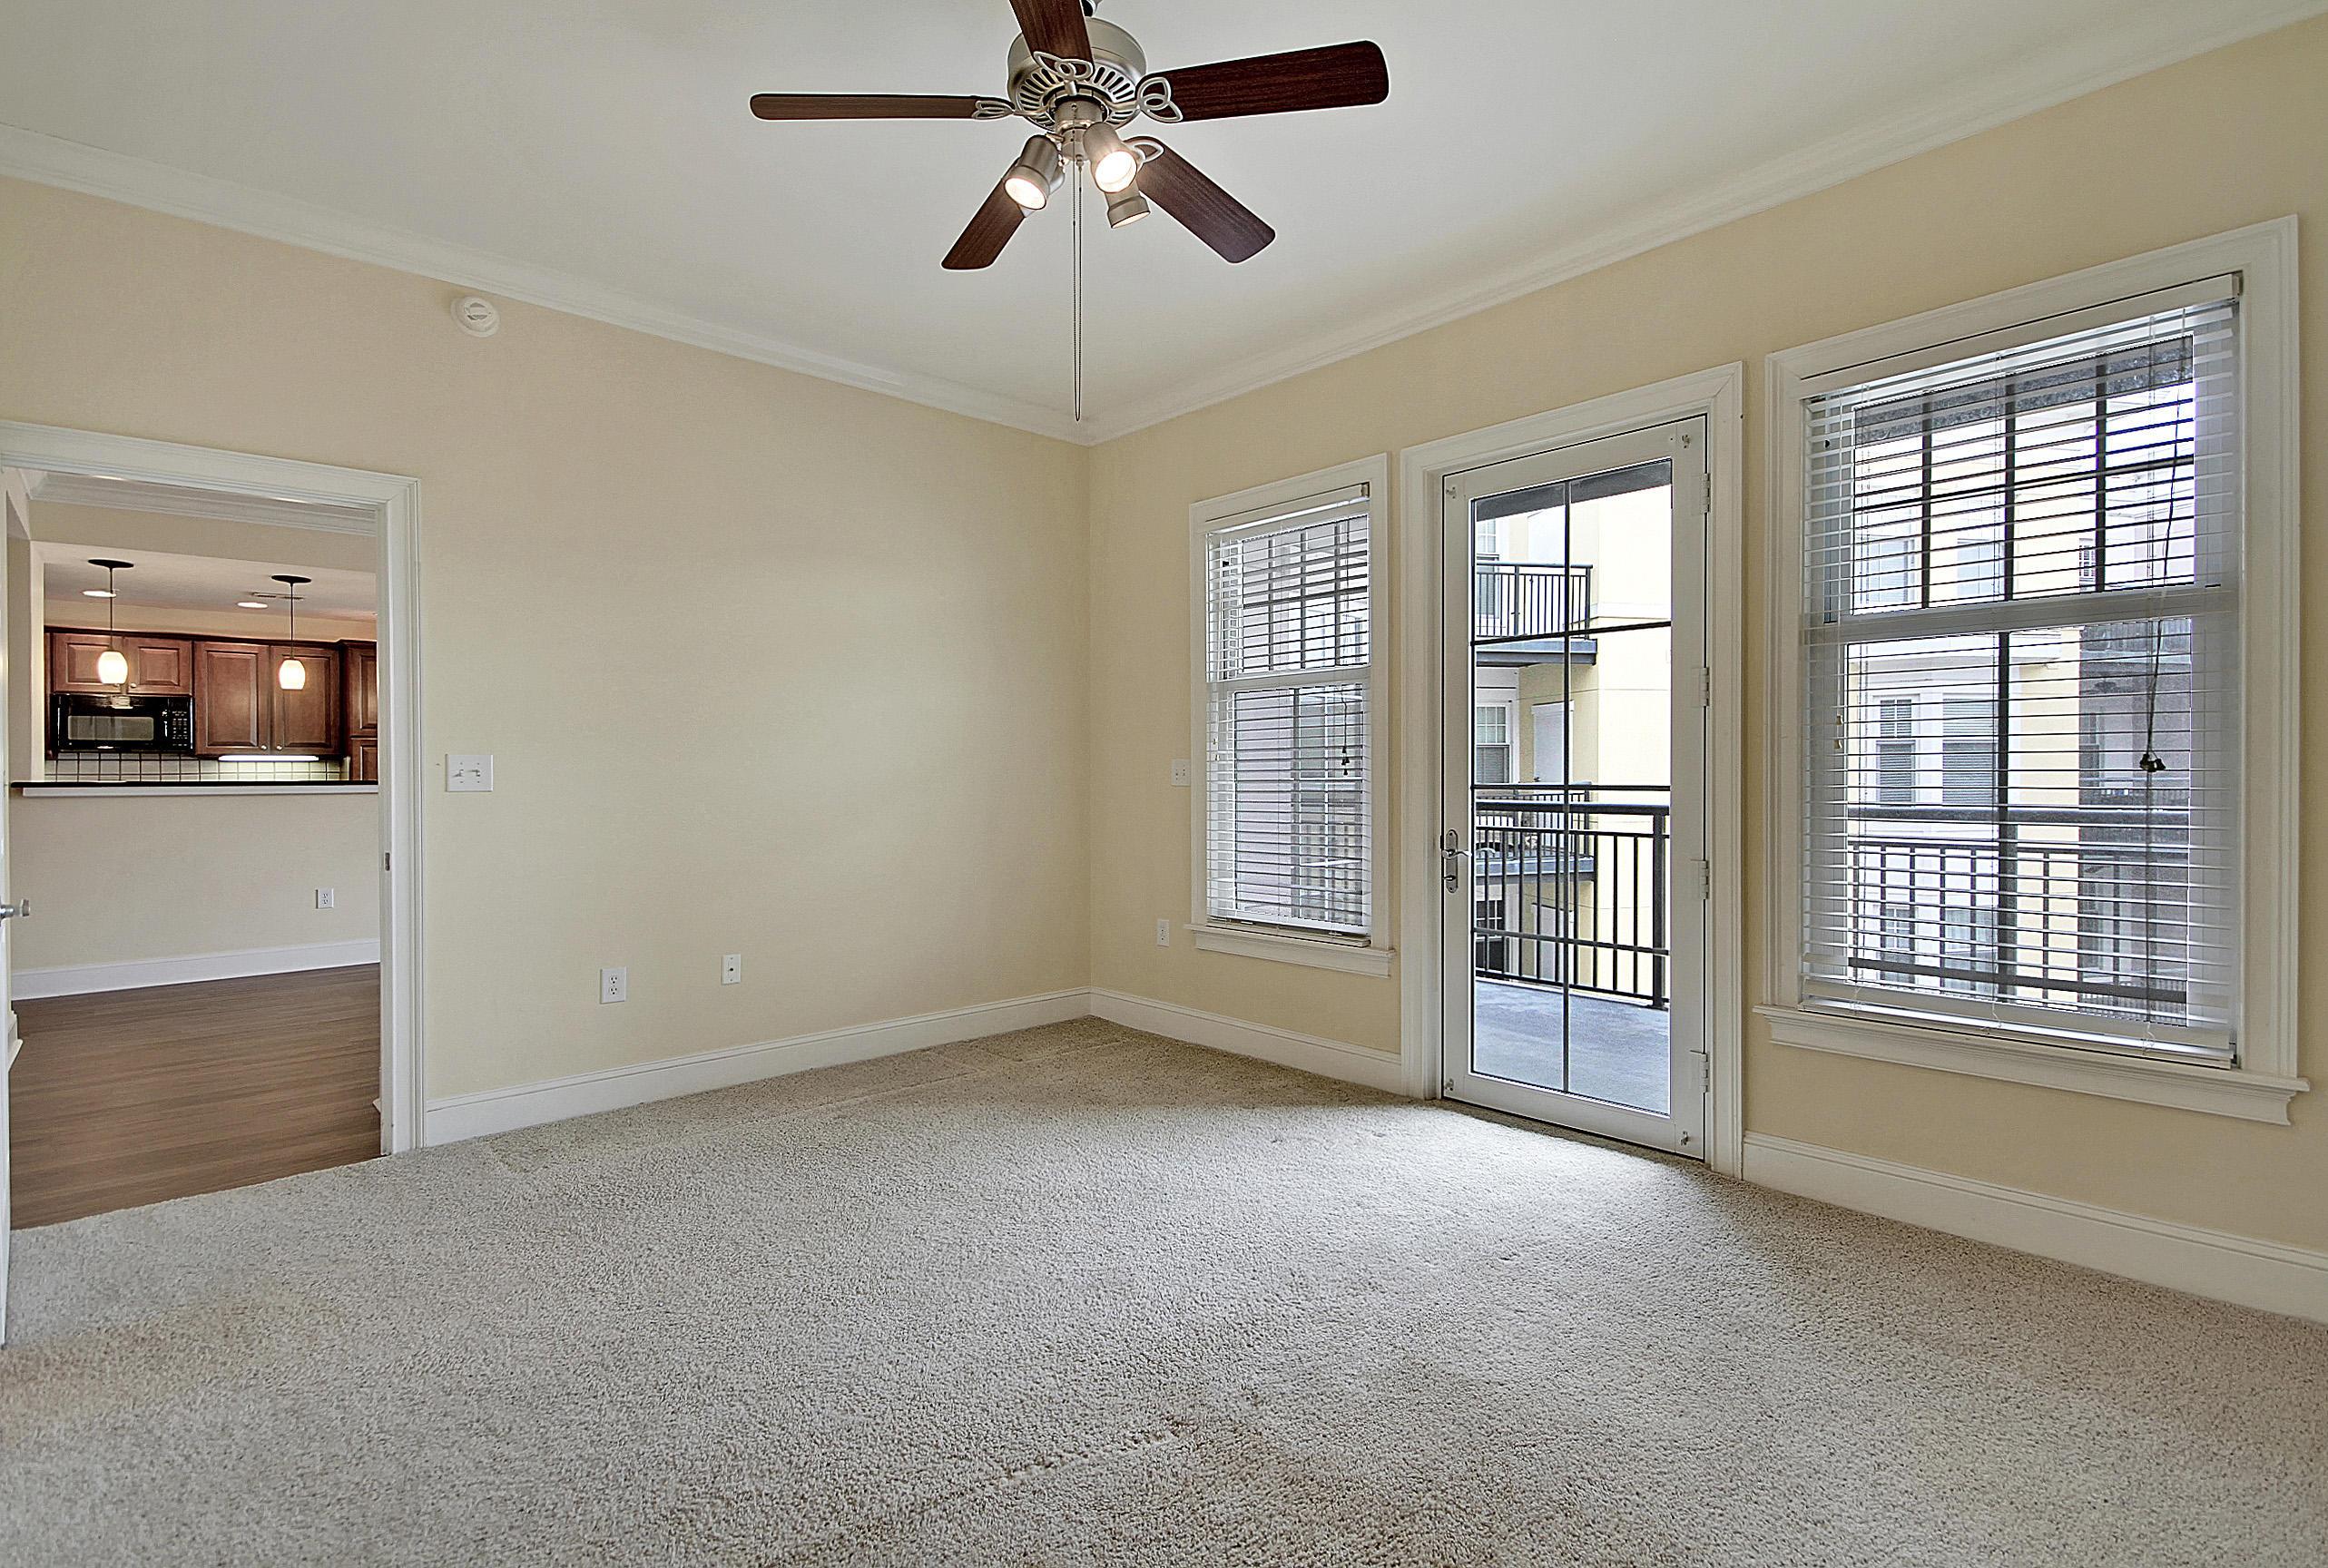 Albemarle Condos For Sale - 498 Albemarle, Charleston, SC - 34